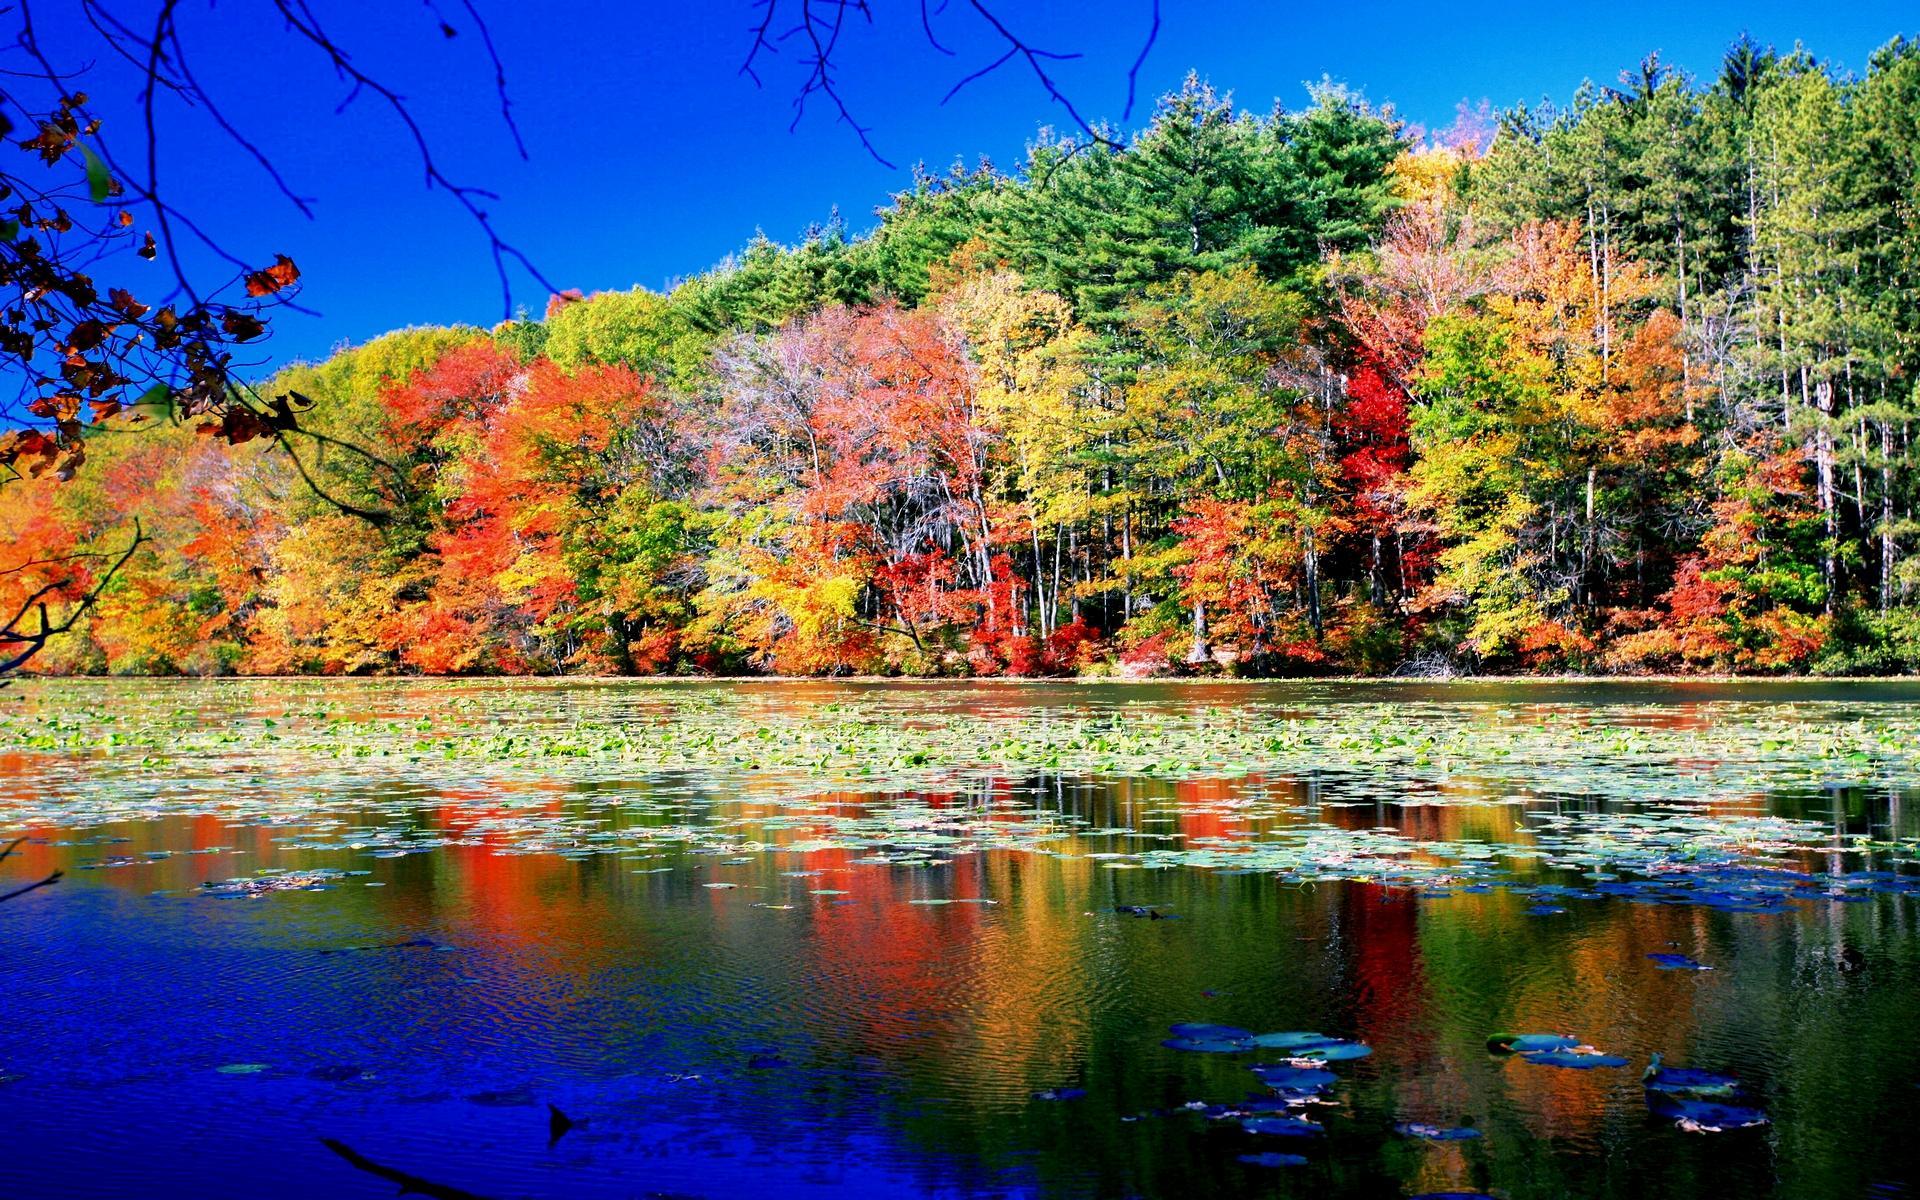 Яркие краски природы картинки для